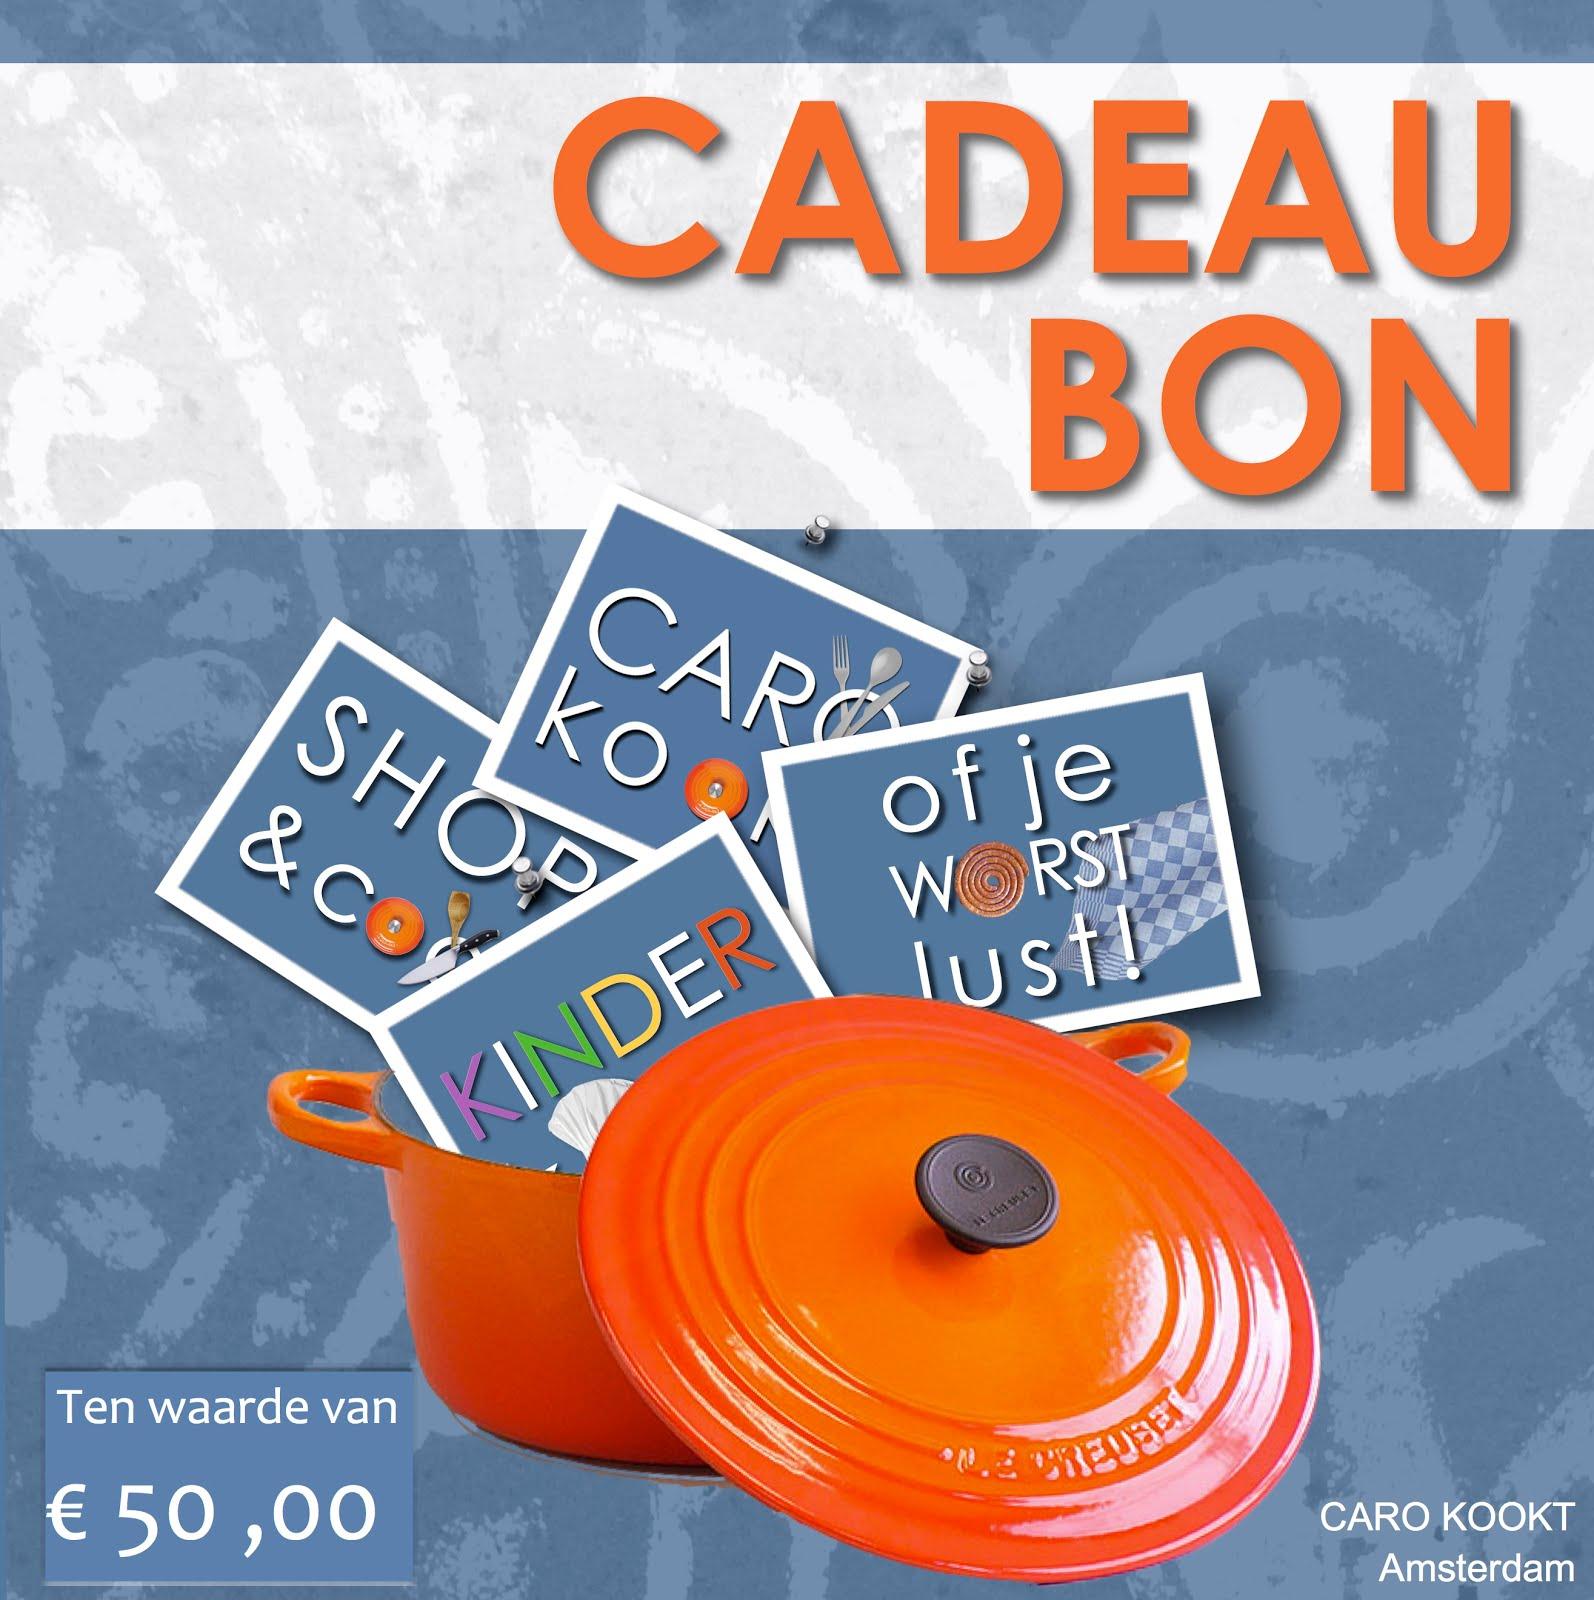 CADEAU BON